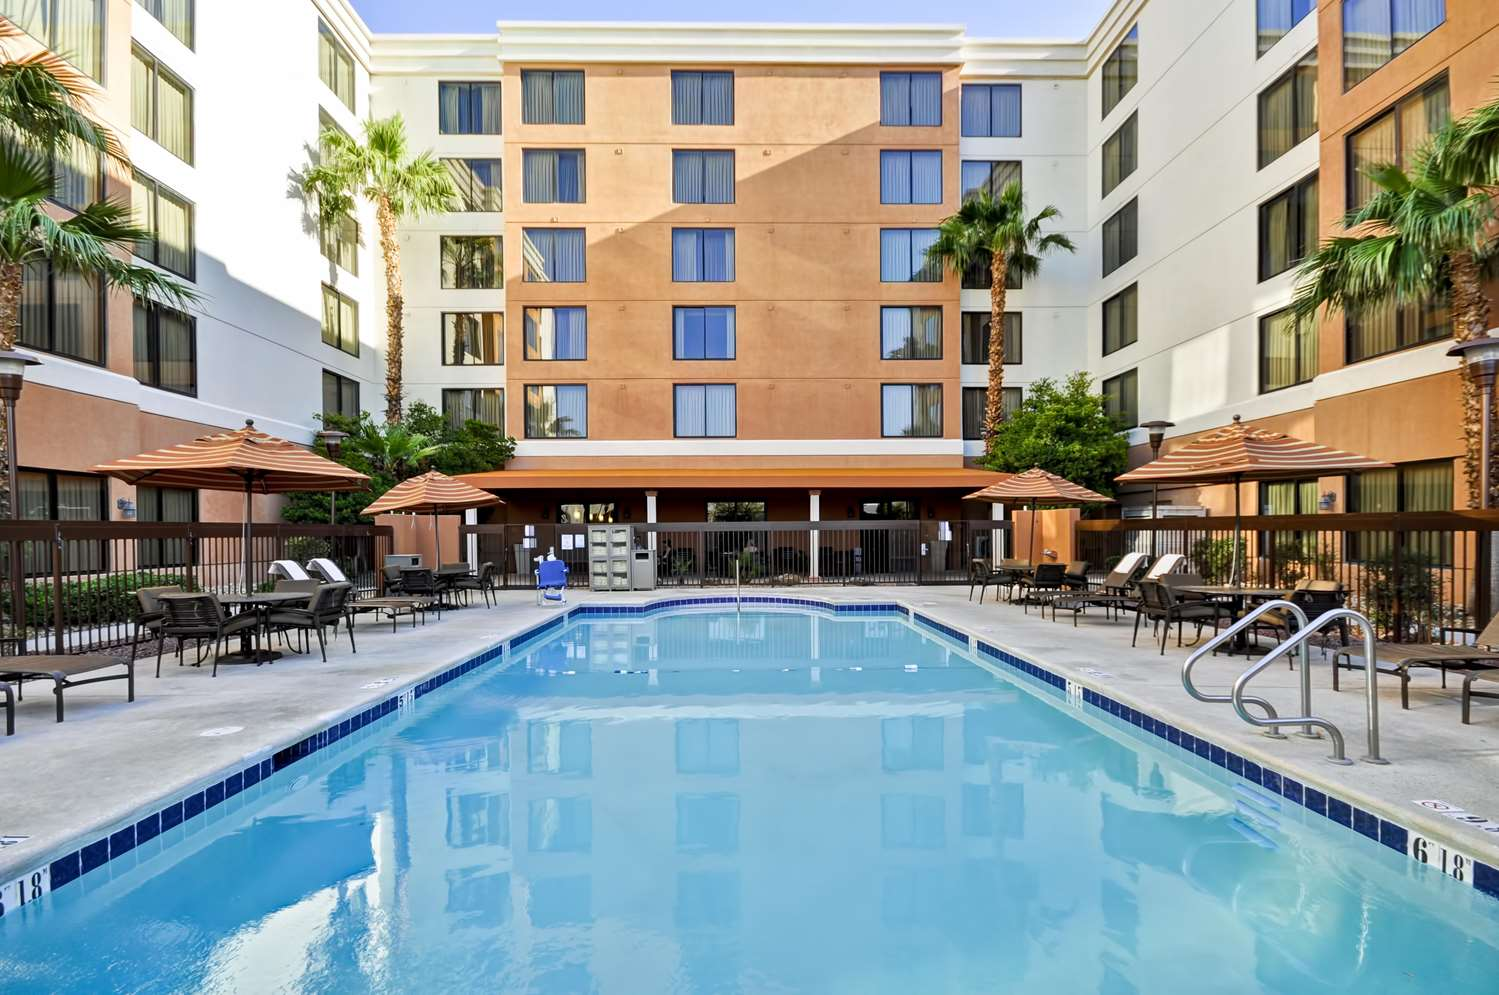 Pool - Hyatt Place Hotel Las Vegas